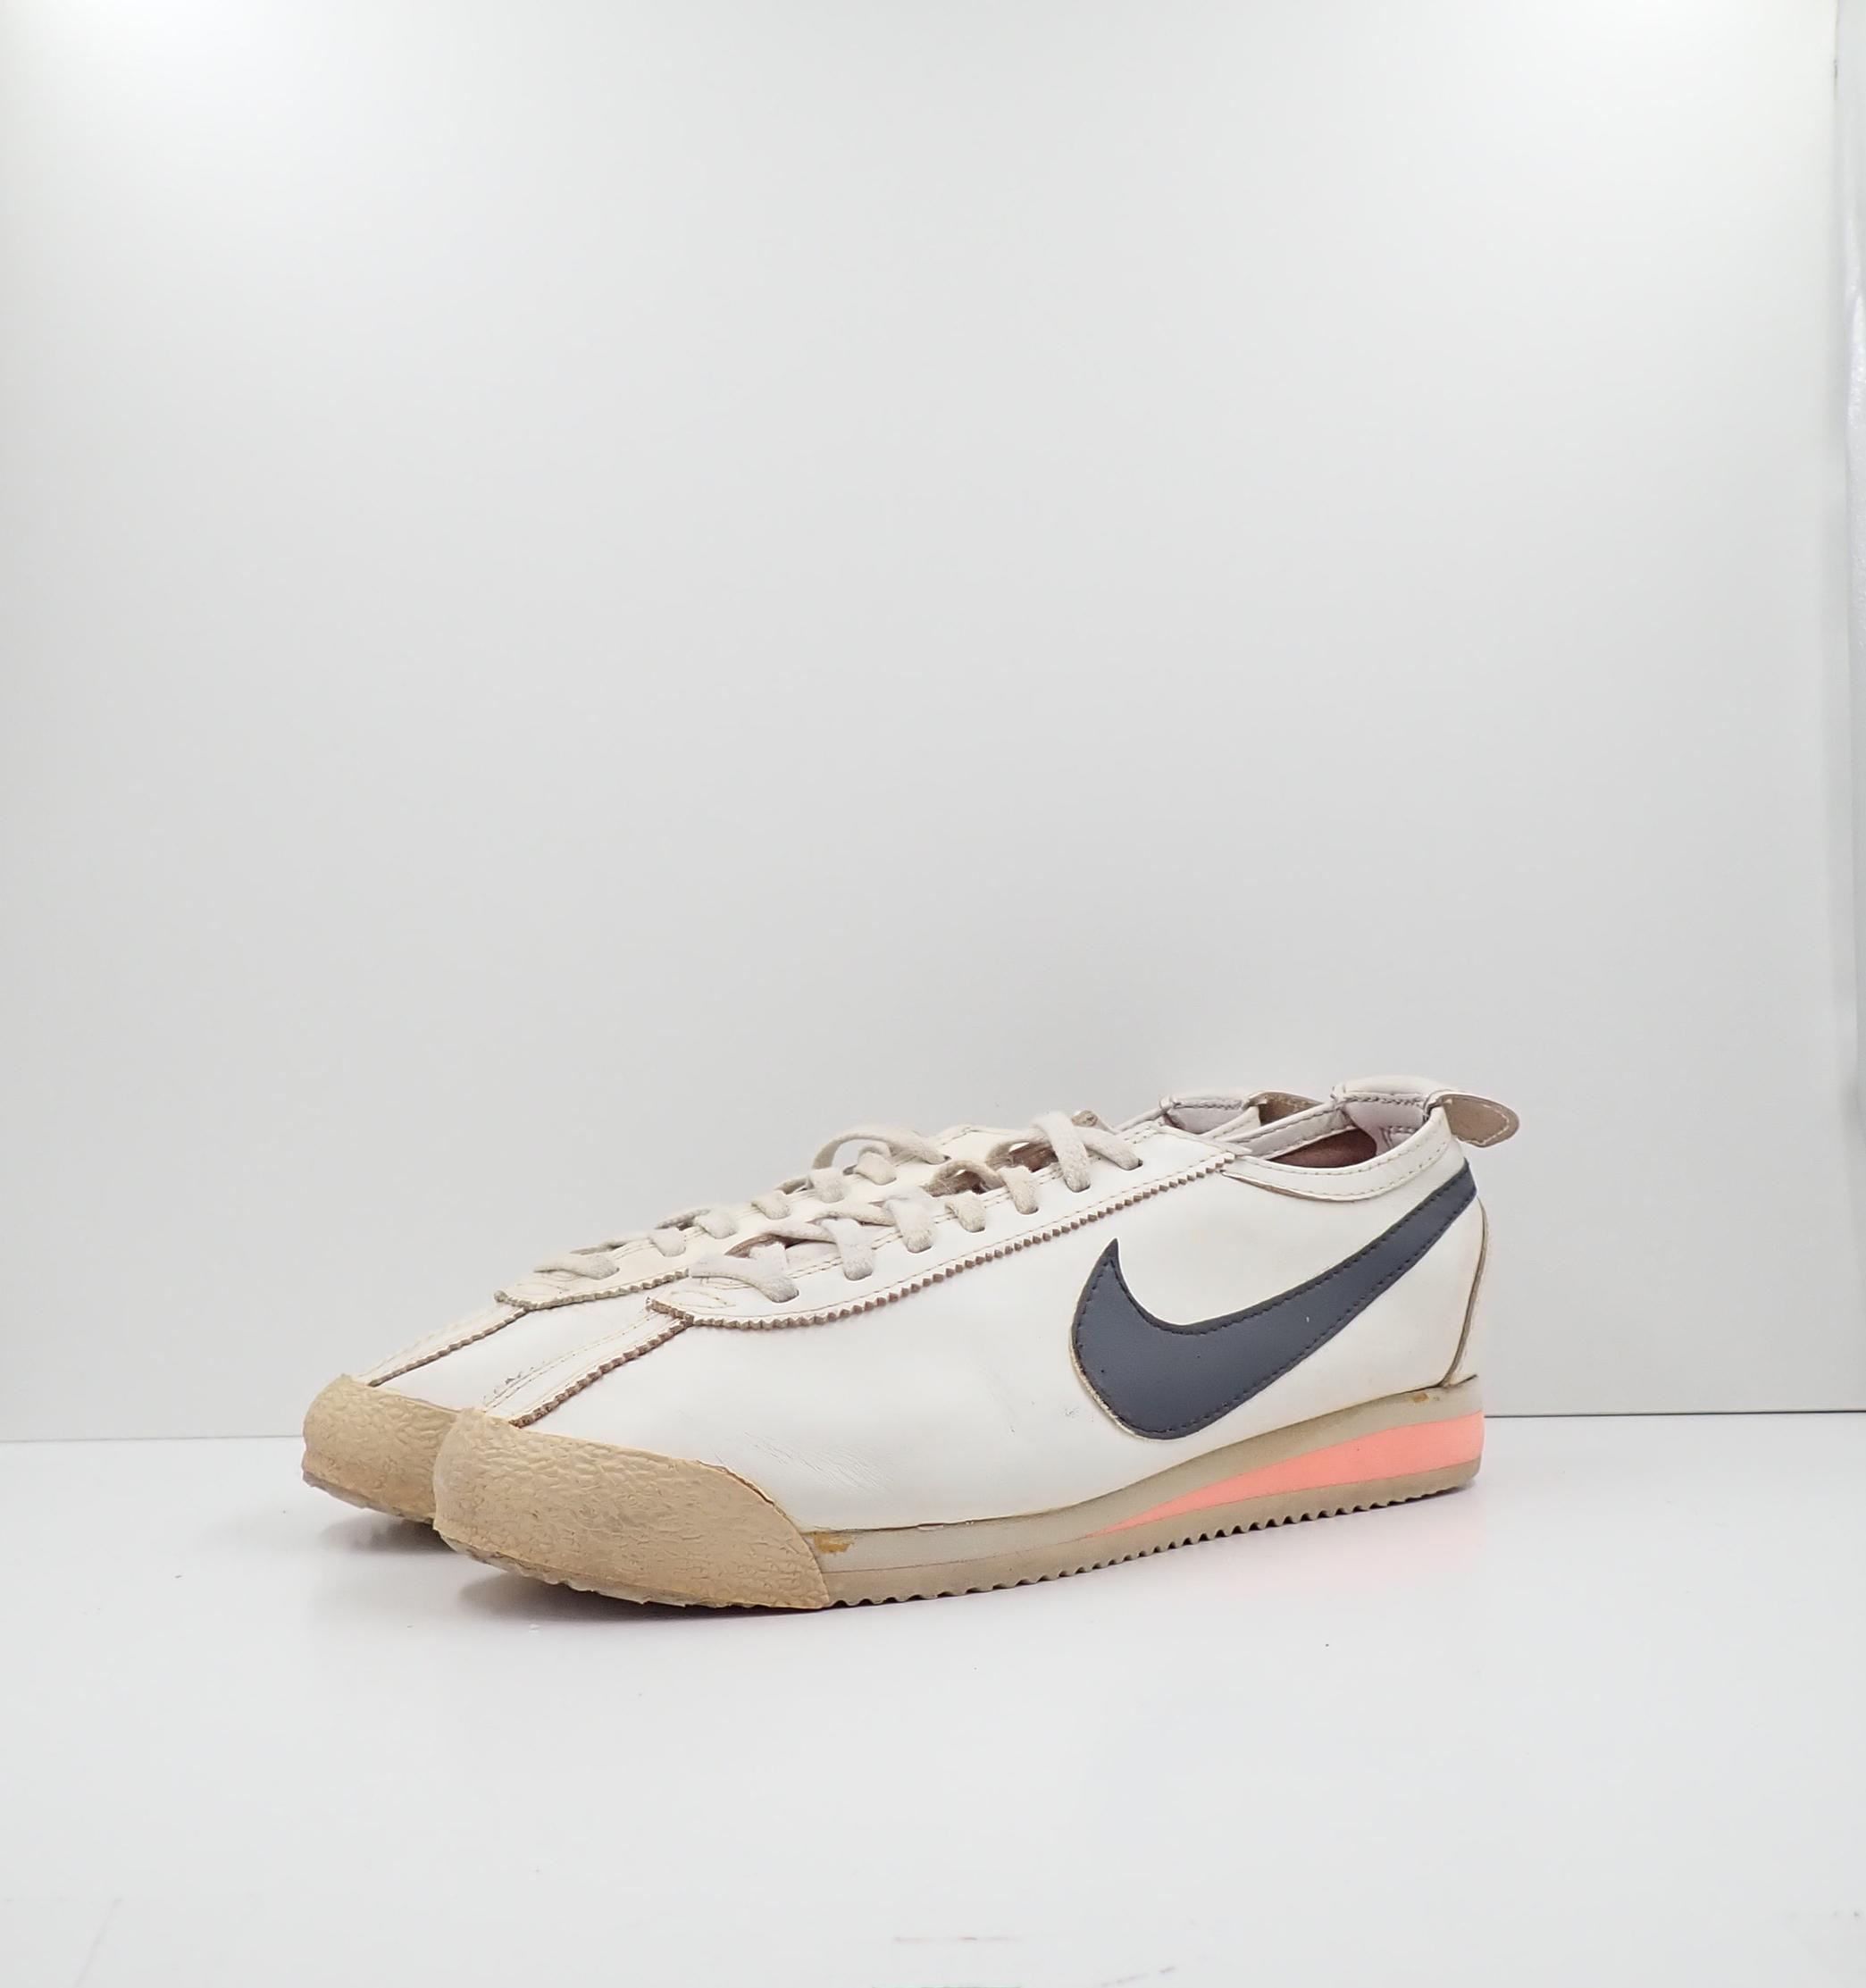 Nike Cortez Leather VNTG